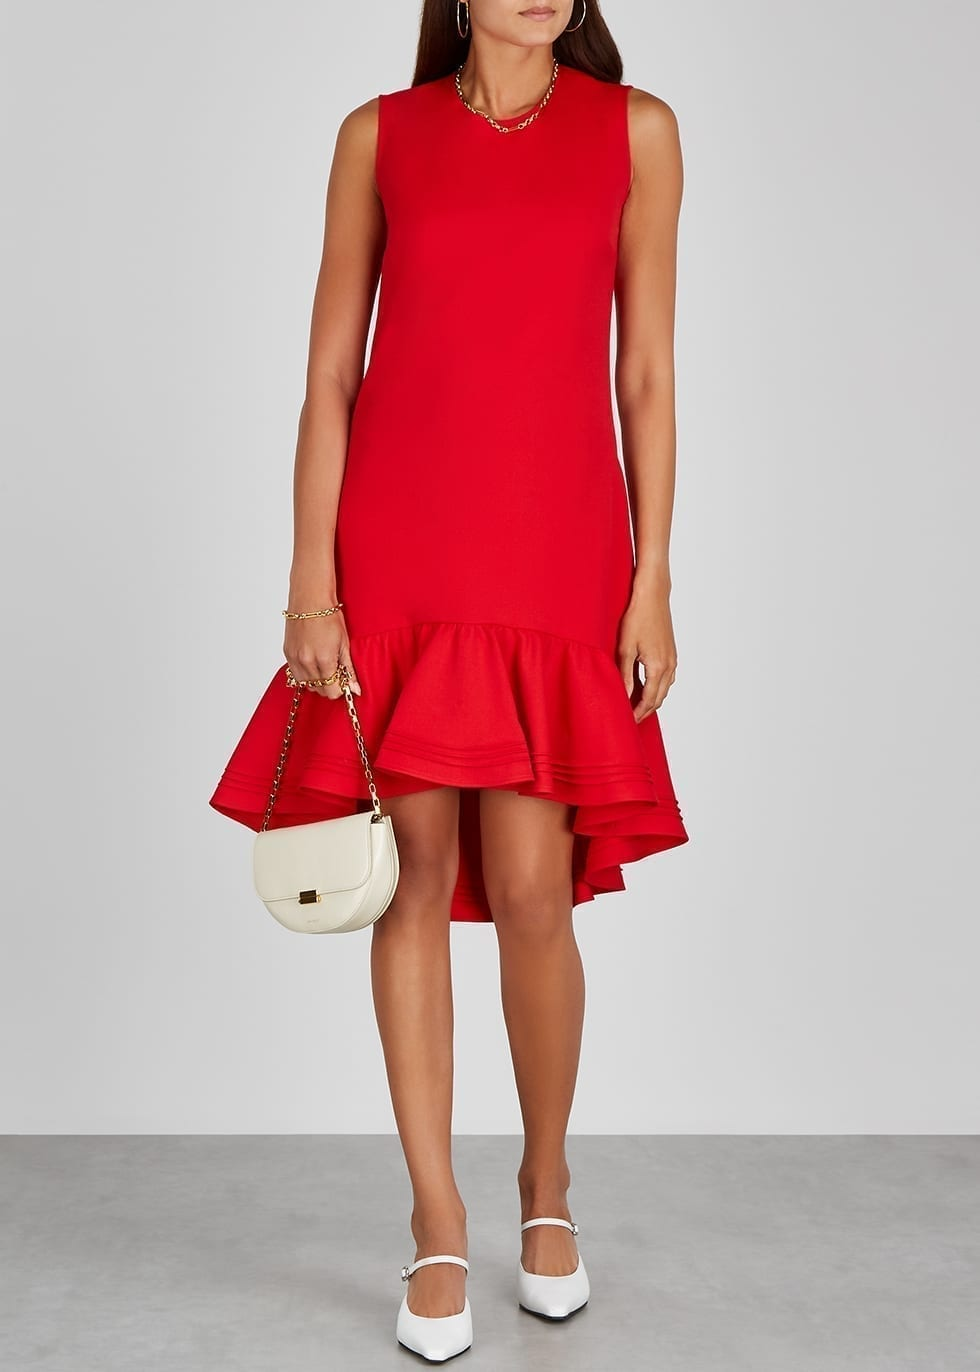 VICTORIA BECKHAM Red Flared-hem Shift Dress